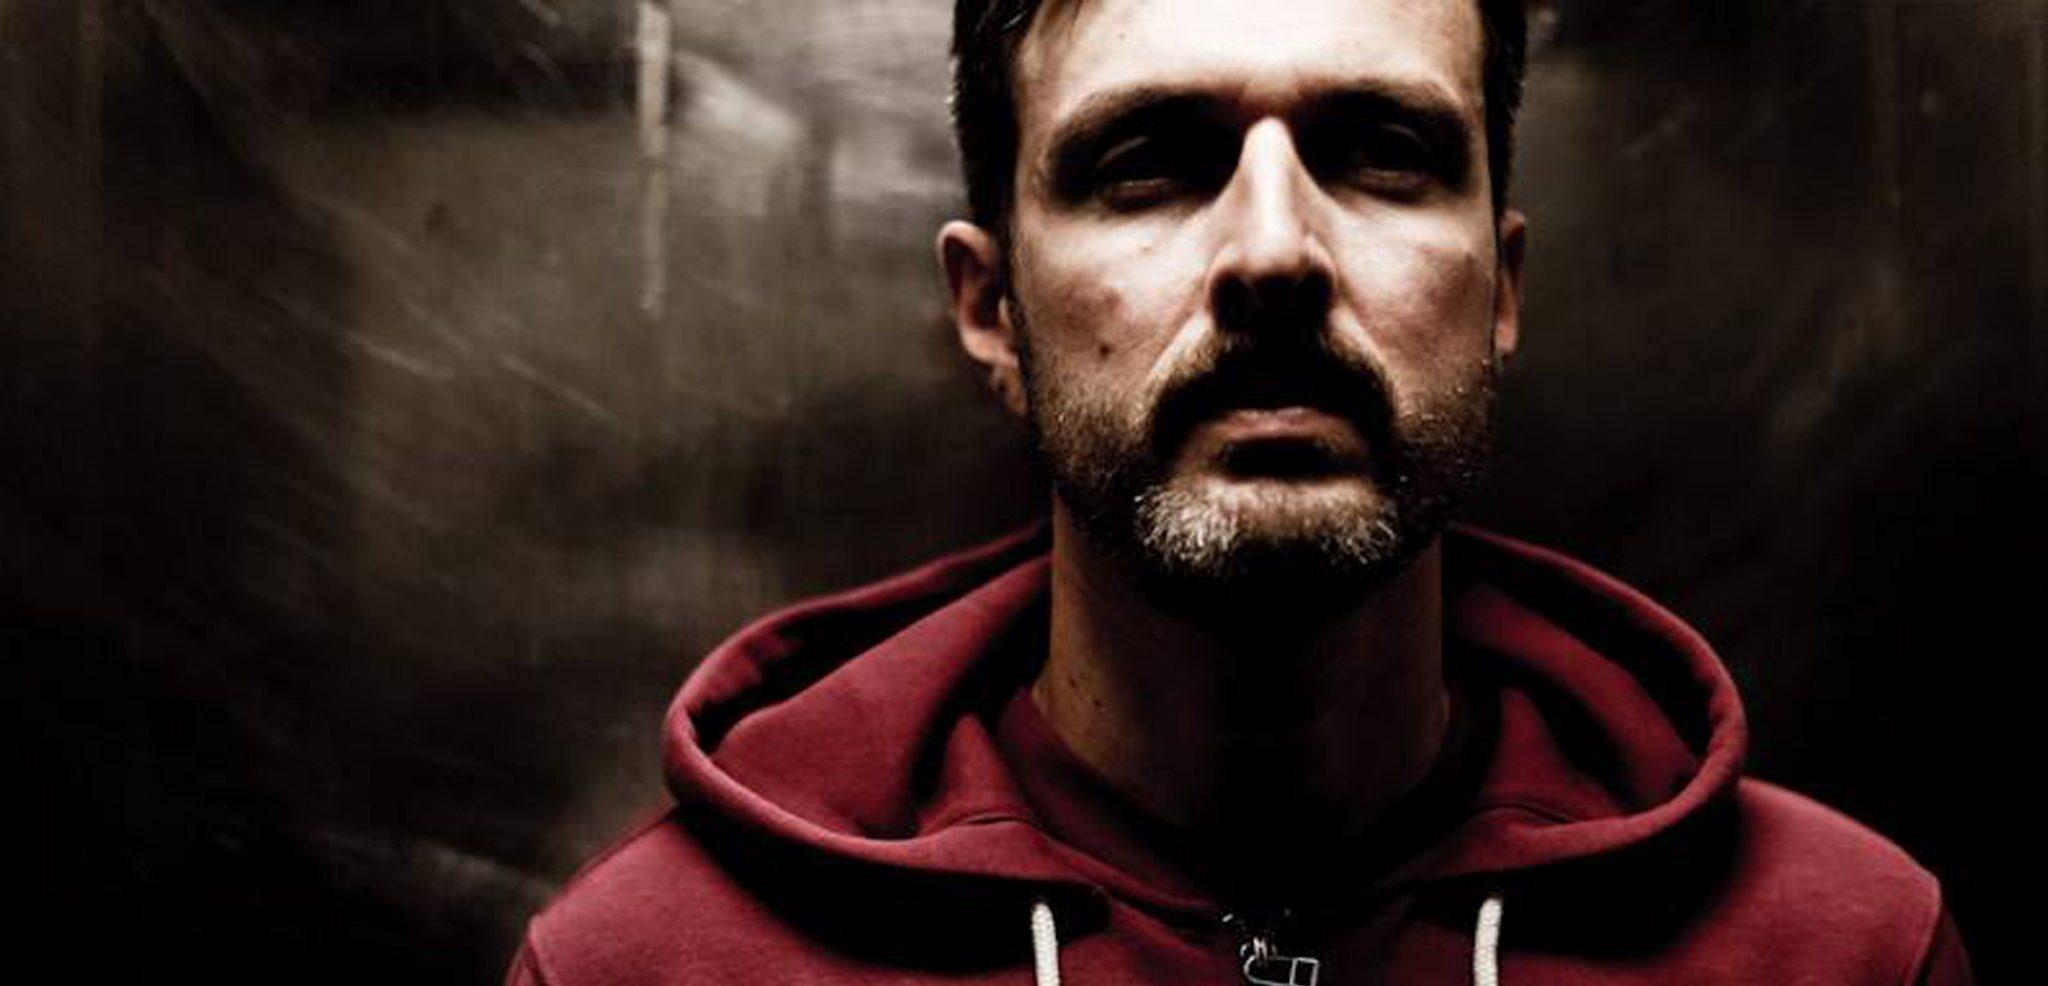 Hugo Barritt - Neu Zeta EP (inc. Lorenzo Dada & Whitesquare remixes) hero